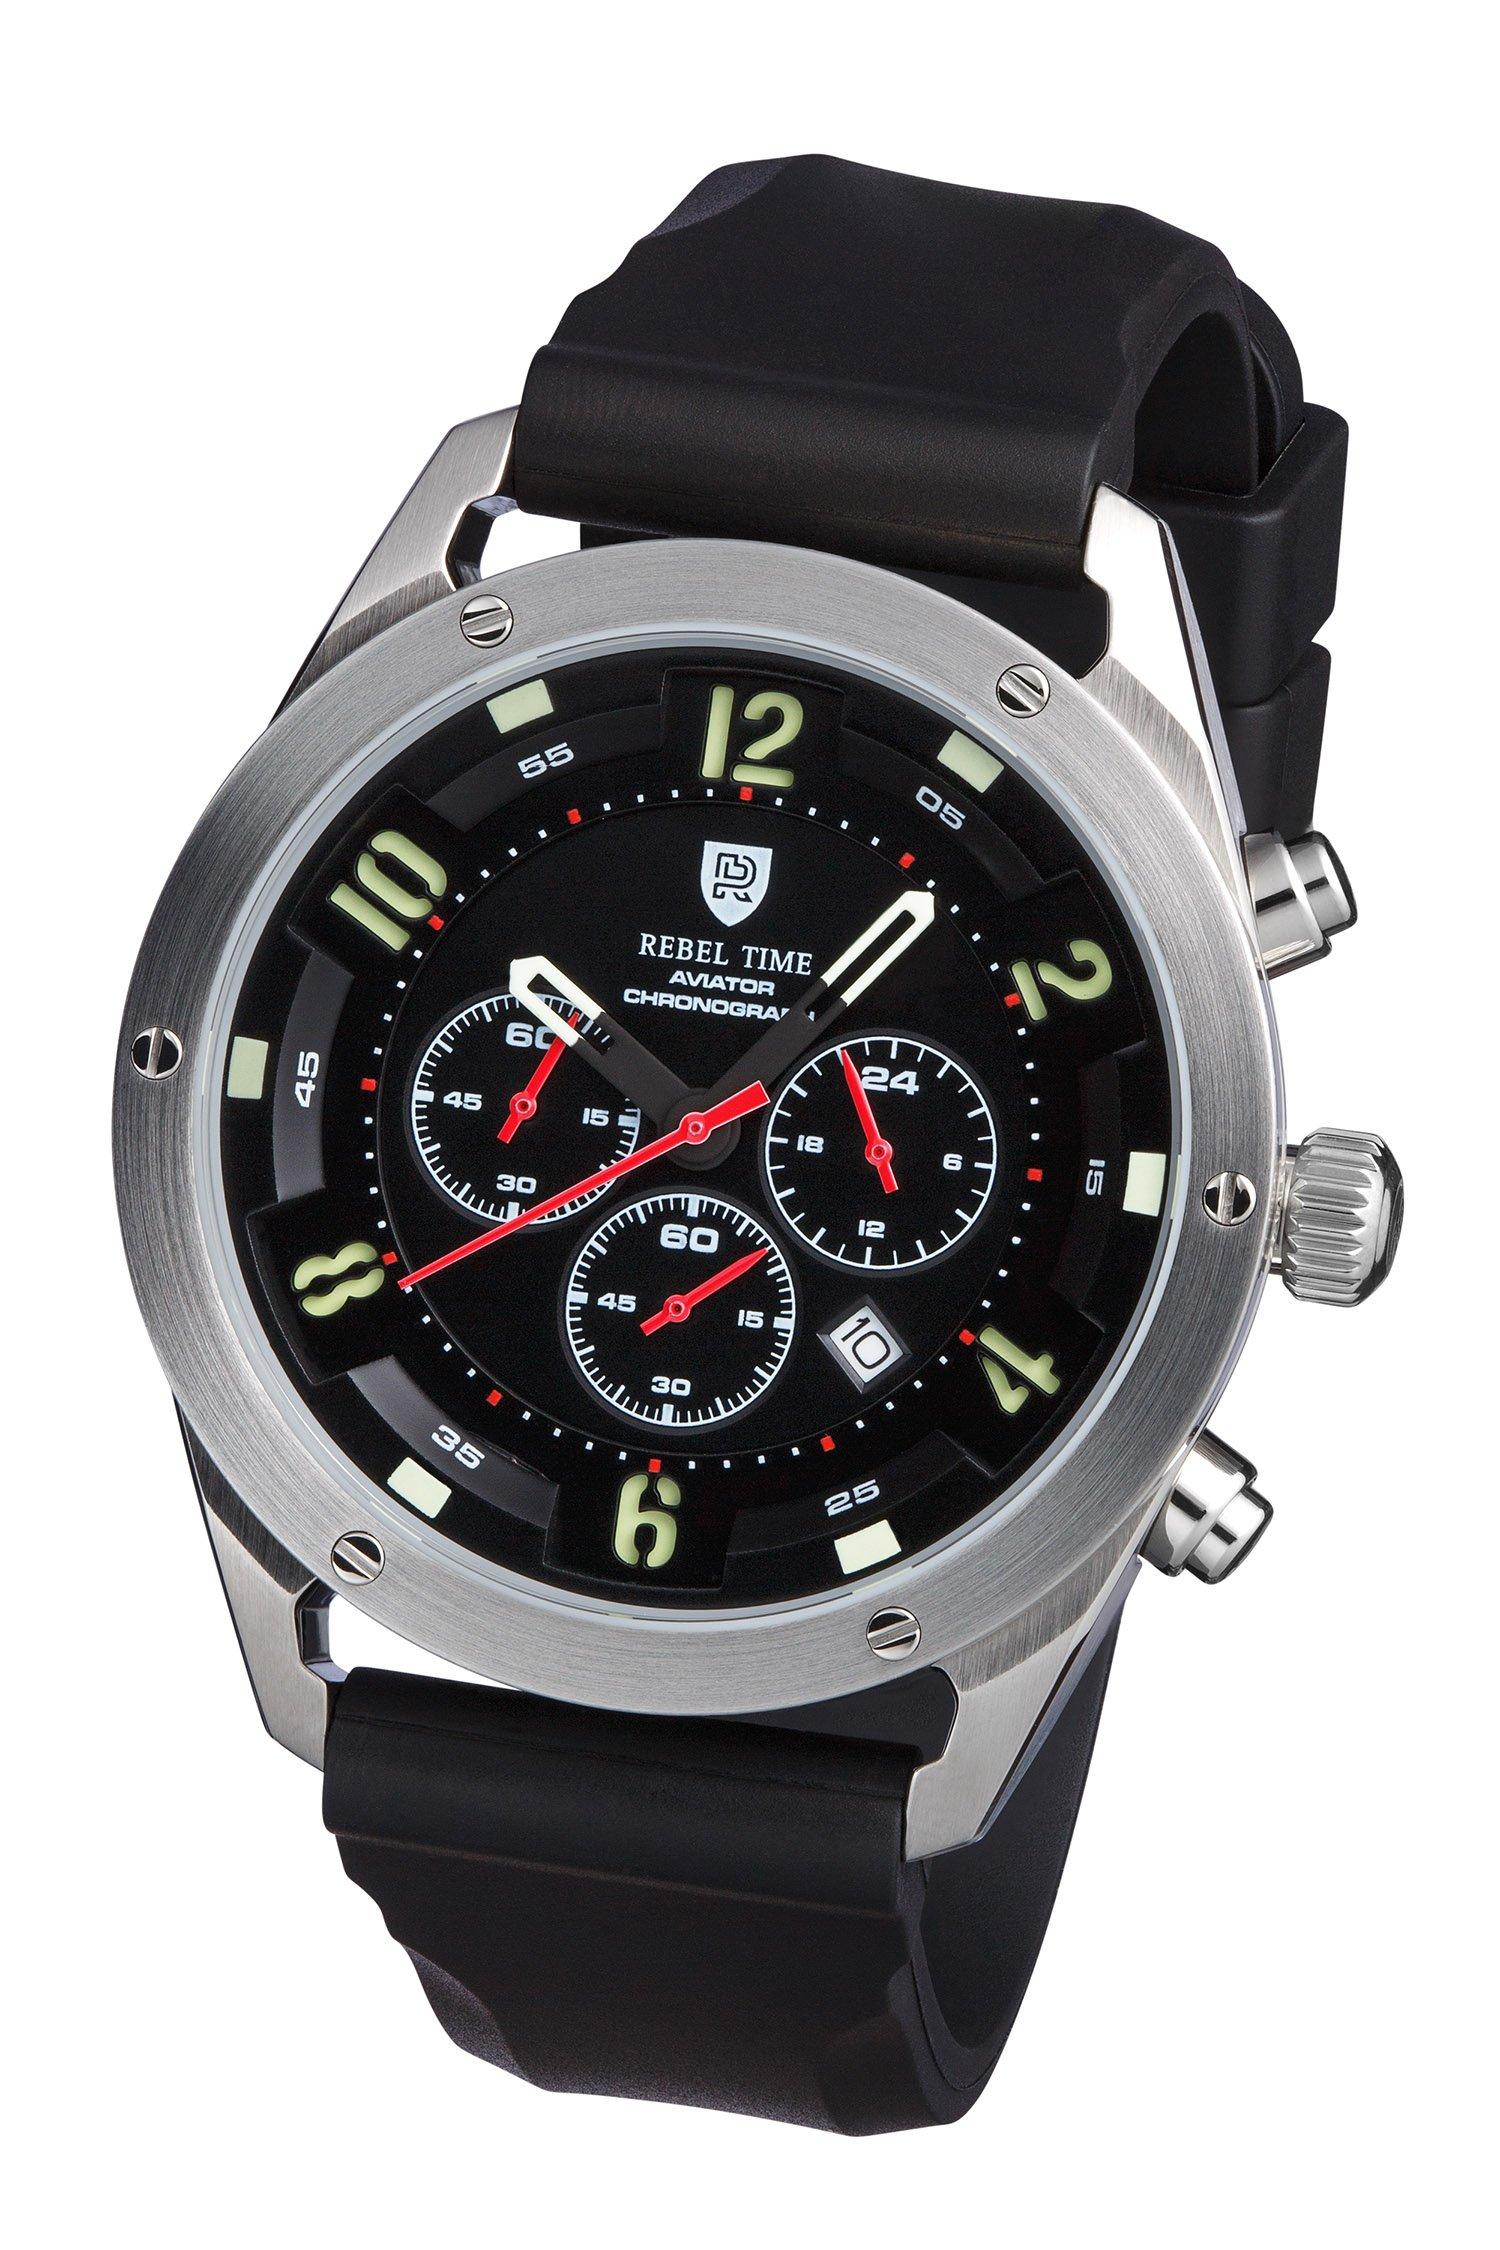 Rebel Men's Aviator Night Black Stainless Steel Chronograph Pilot Watch 100 Meter WR